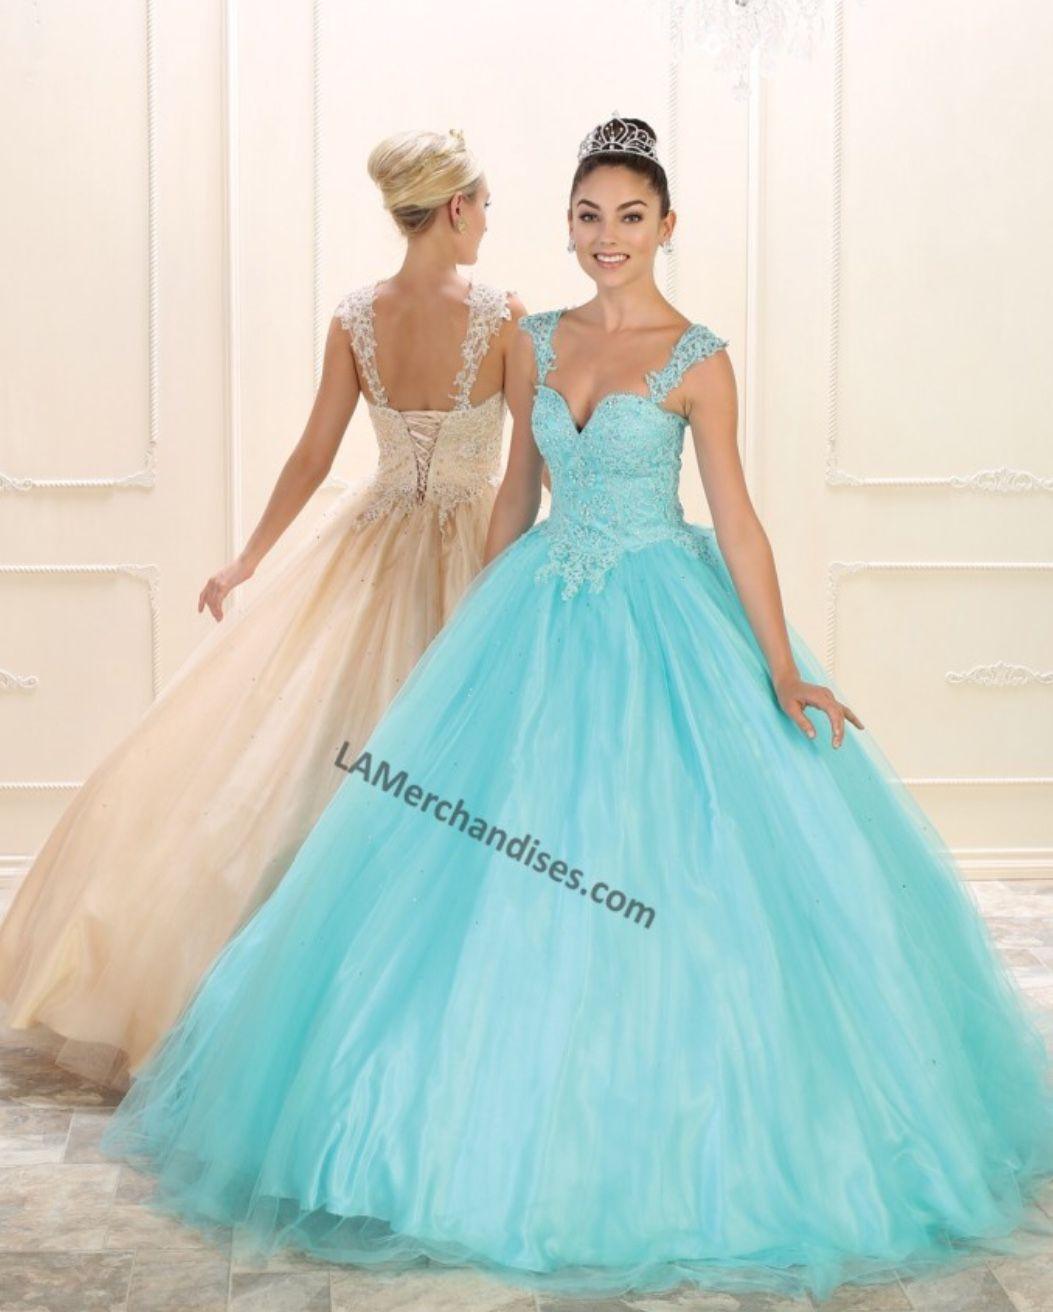 Comfortable Prom Dresses Milwaukee Wi Photos - Wedding Dress Ideas ...